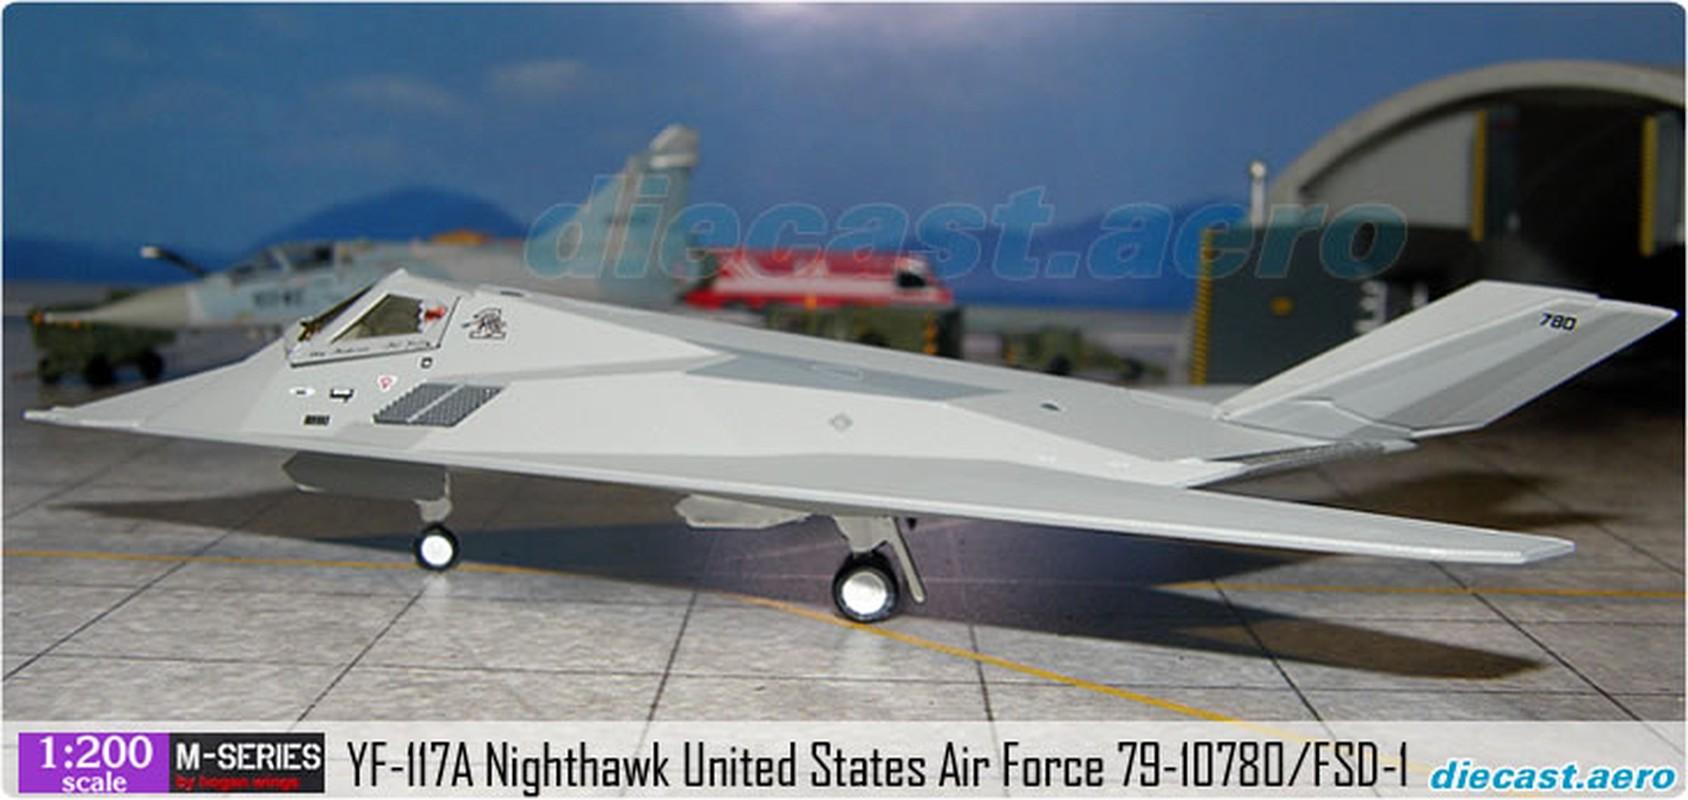 Cach quan doi My giu bi mat tuyet doi sieu co F-117A-Hinh-2